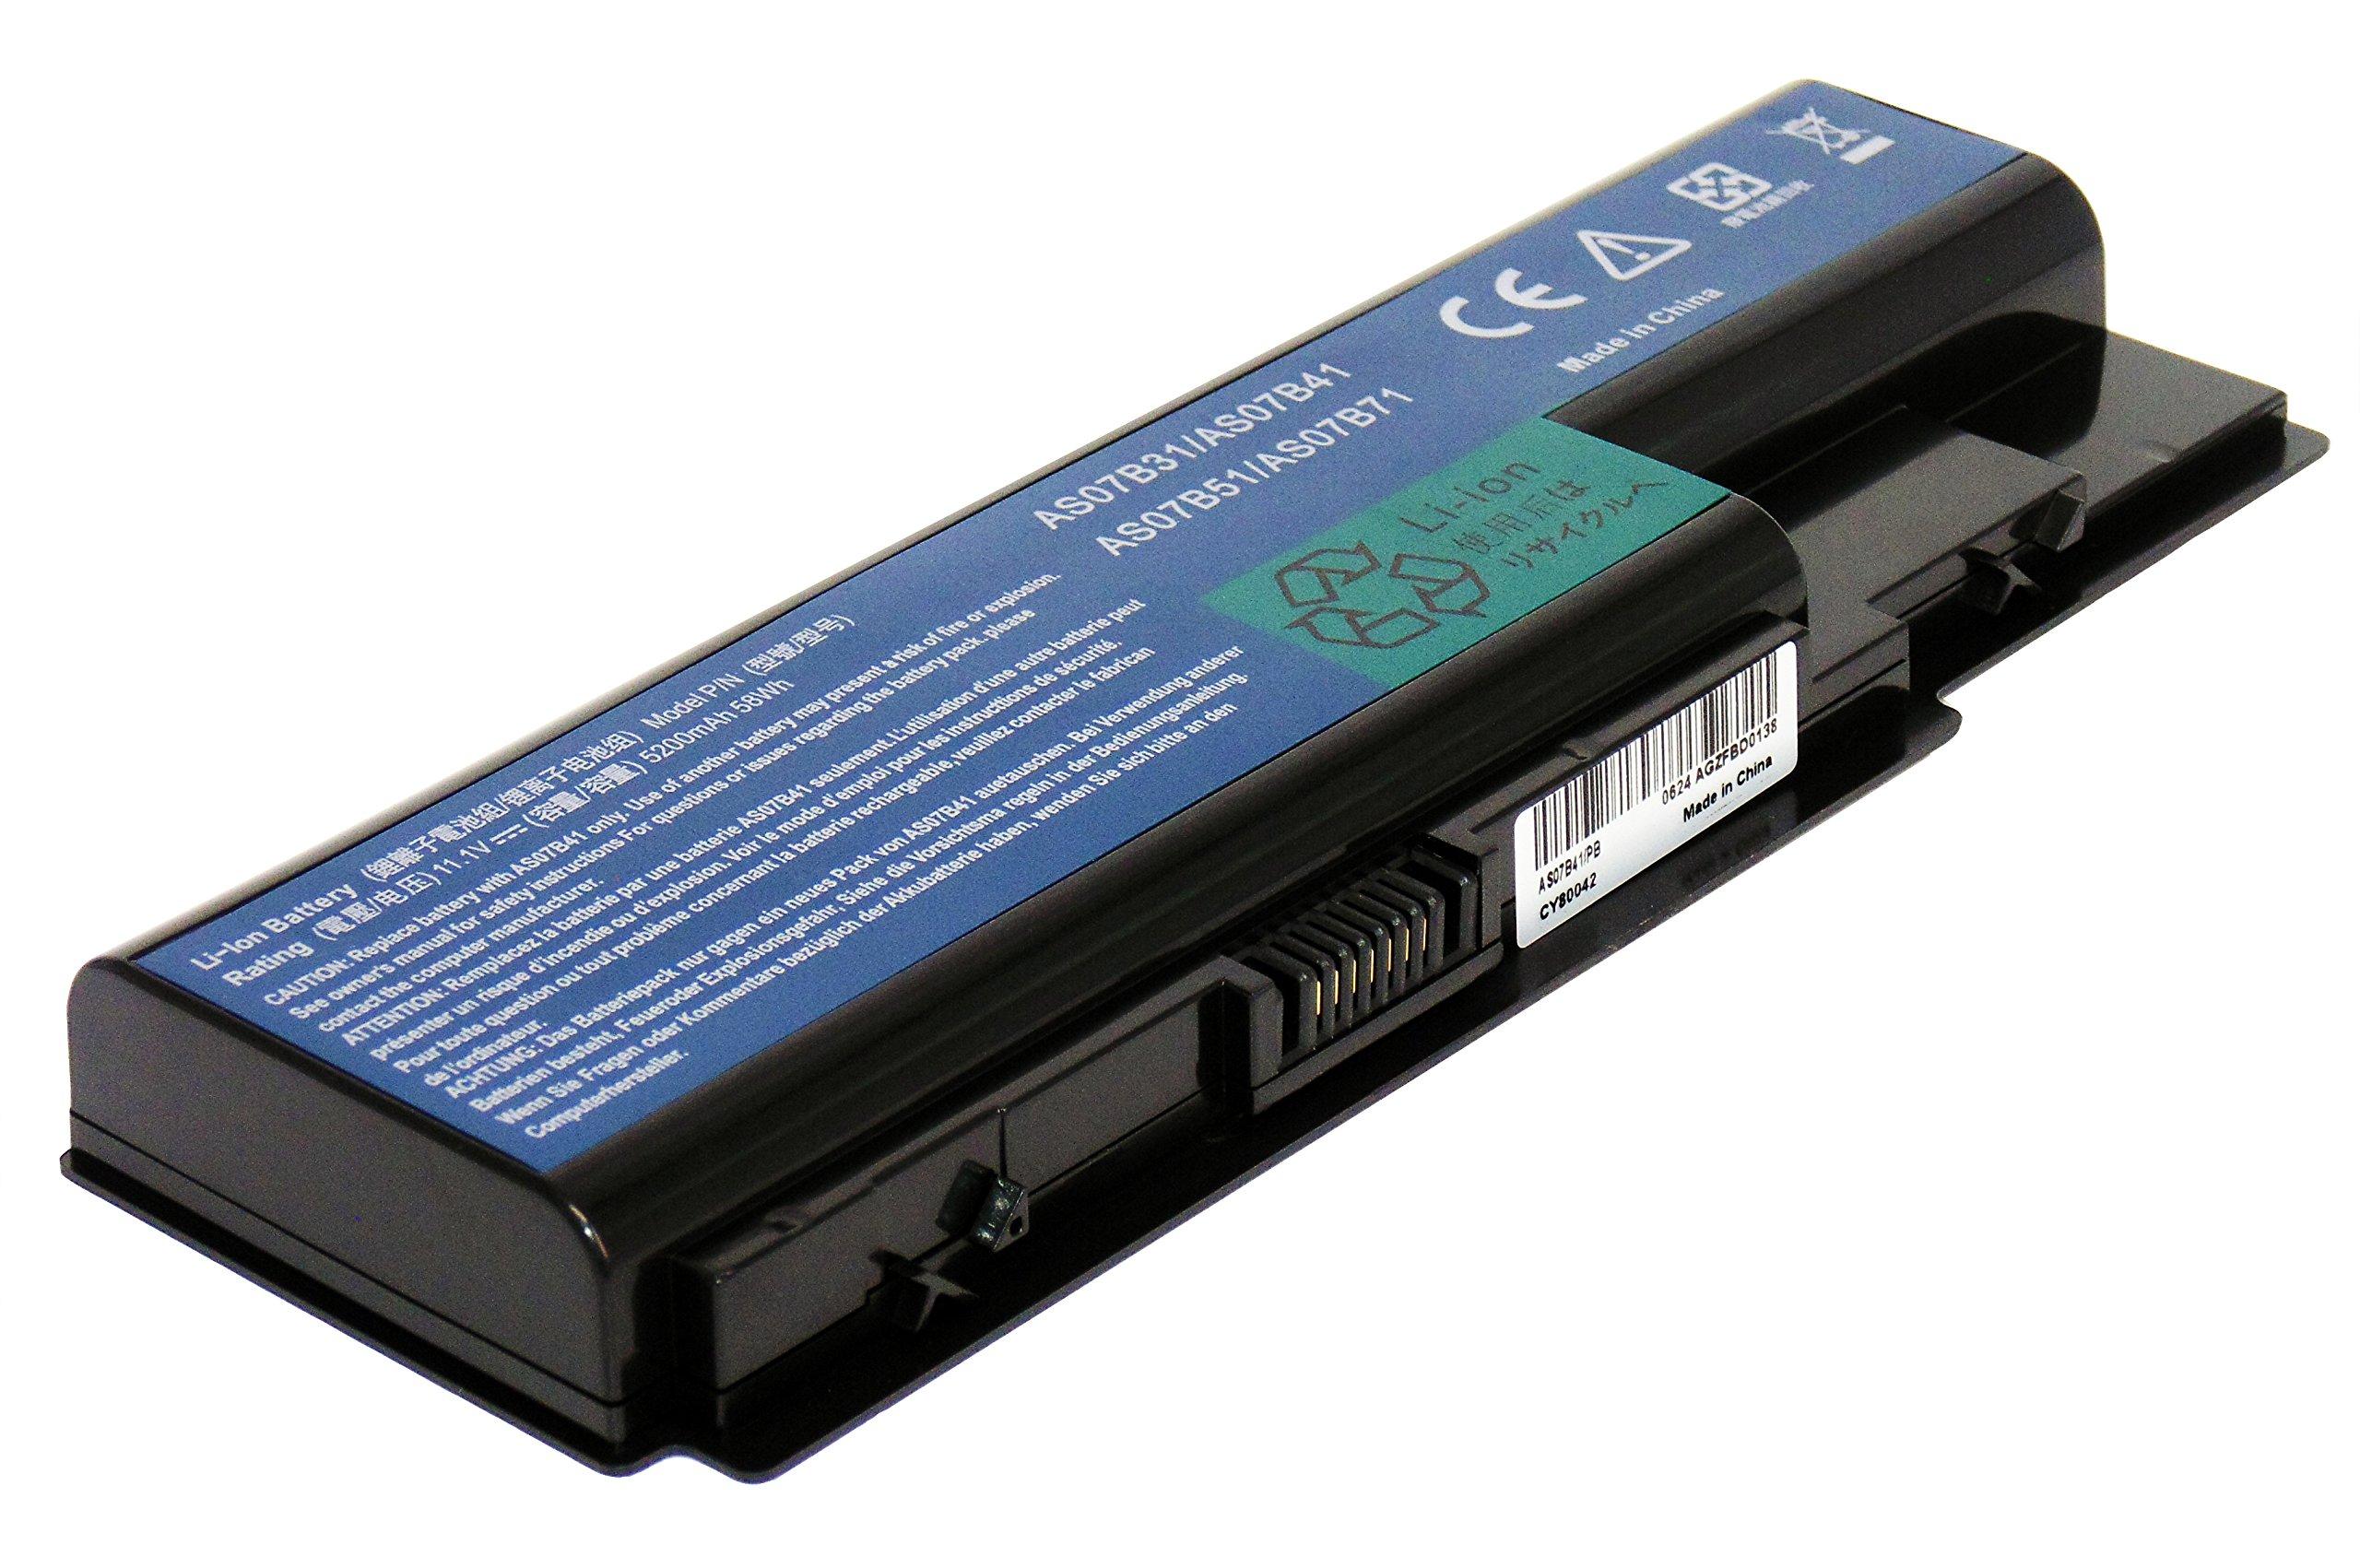 5200mAh 11.1V ARyee 5920 Batterie Compatible avec Acer Aspire Aspire 5920 5920G 5520 5530 6530 AS07B31 AS07B32 AS07B41 AS07B42 AS07B51 AS07B52 AS07B61 AS07B71 AS07B71 AS07B72